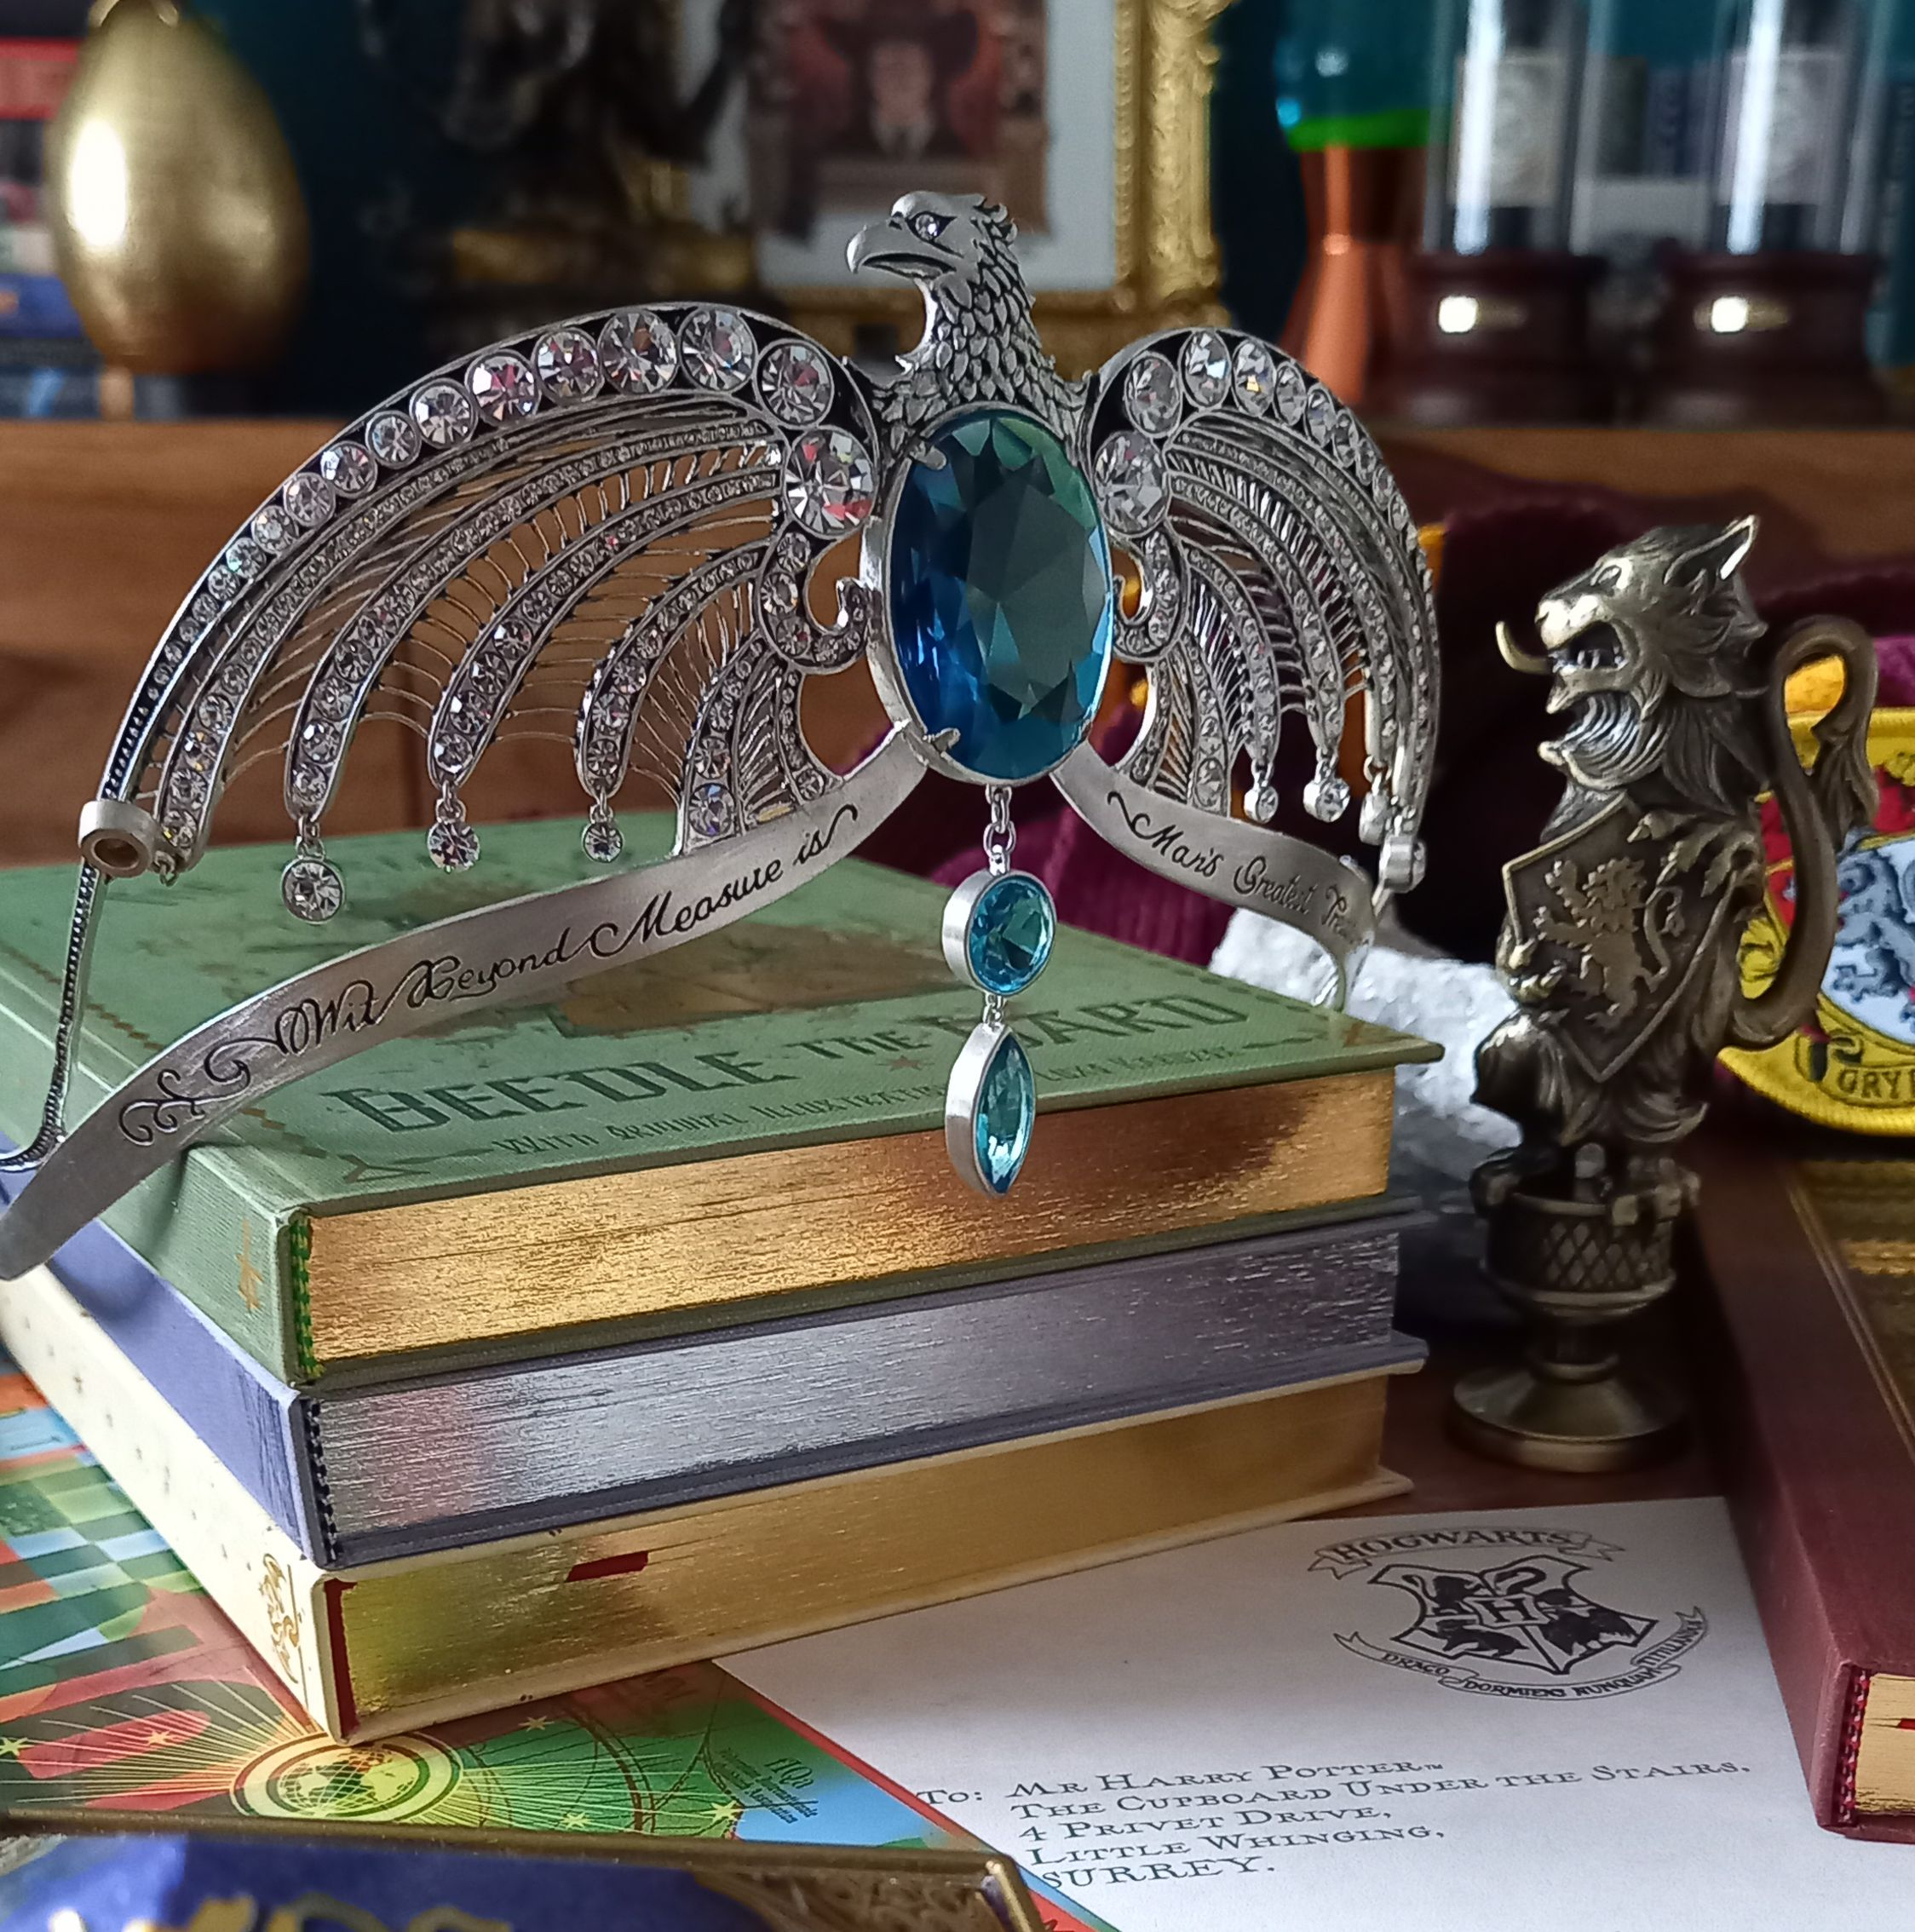 Rowena-Ravenclaw-Diadem-Noble-Collection-Replik-Harry-Potter-Fanartikel-3